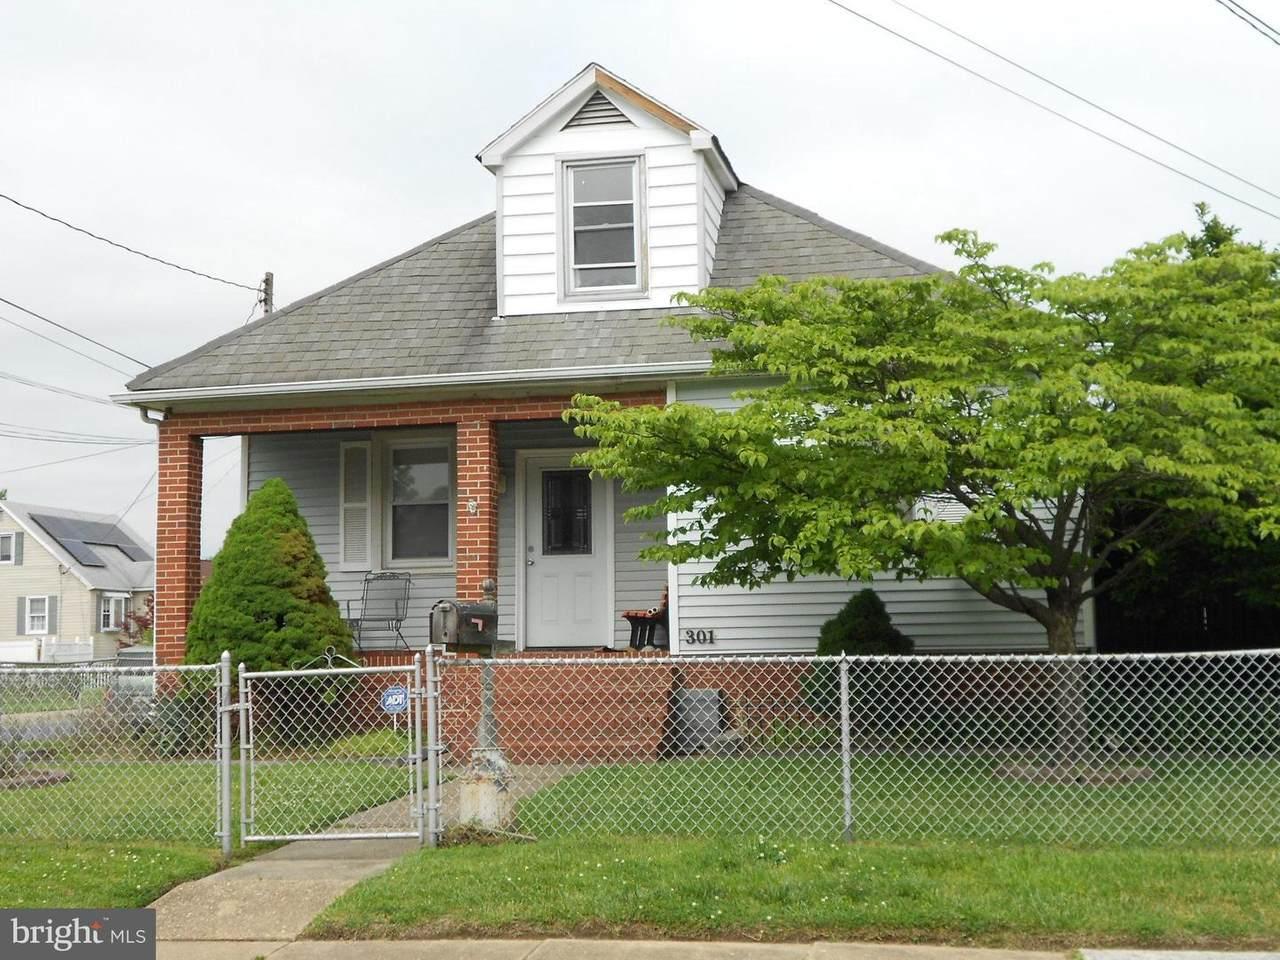 301 Taylor Avenue - Photo 1